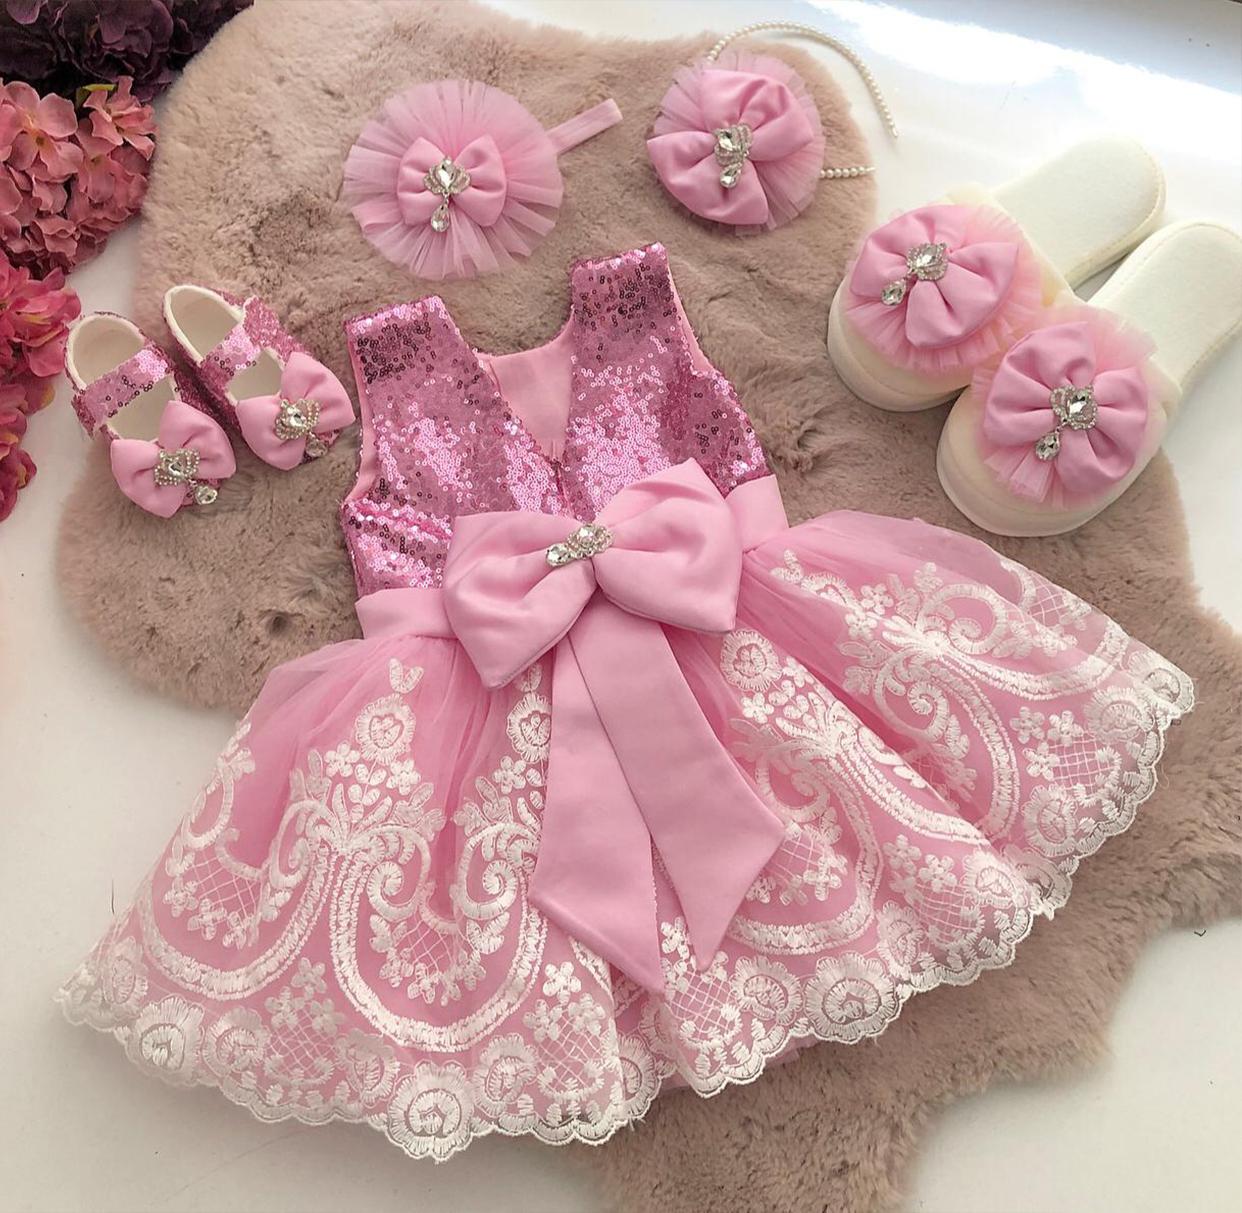 pembe-renk-desenli-kız-bebek-elbisesi